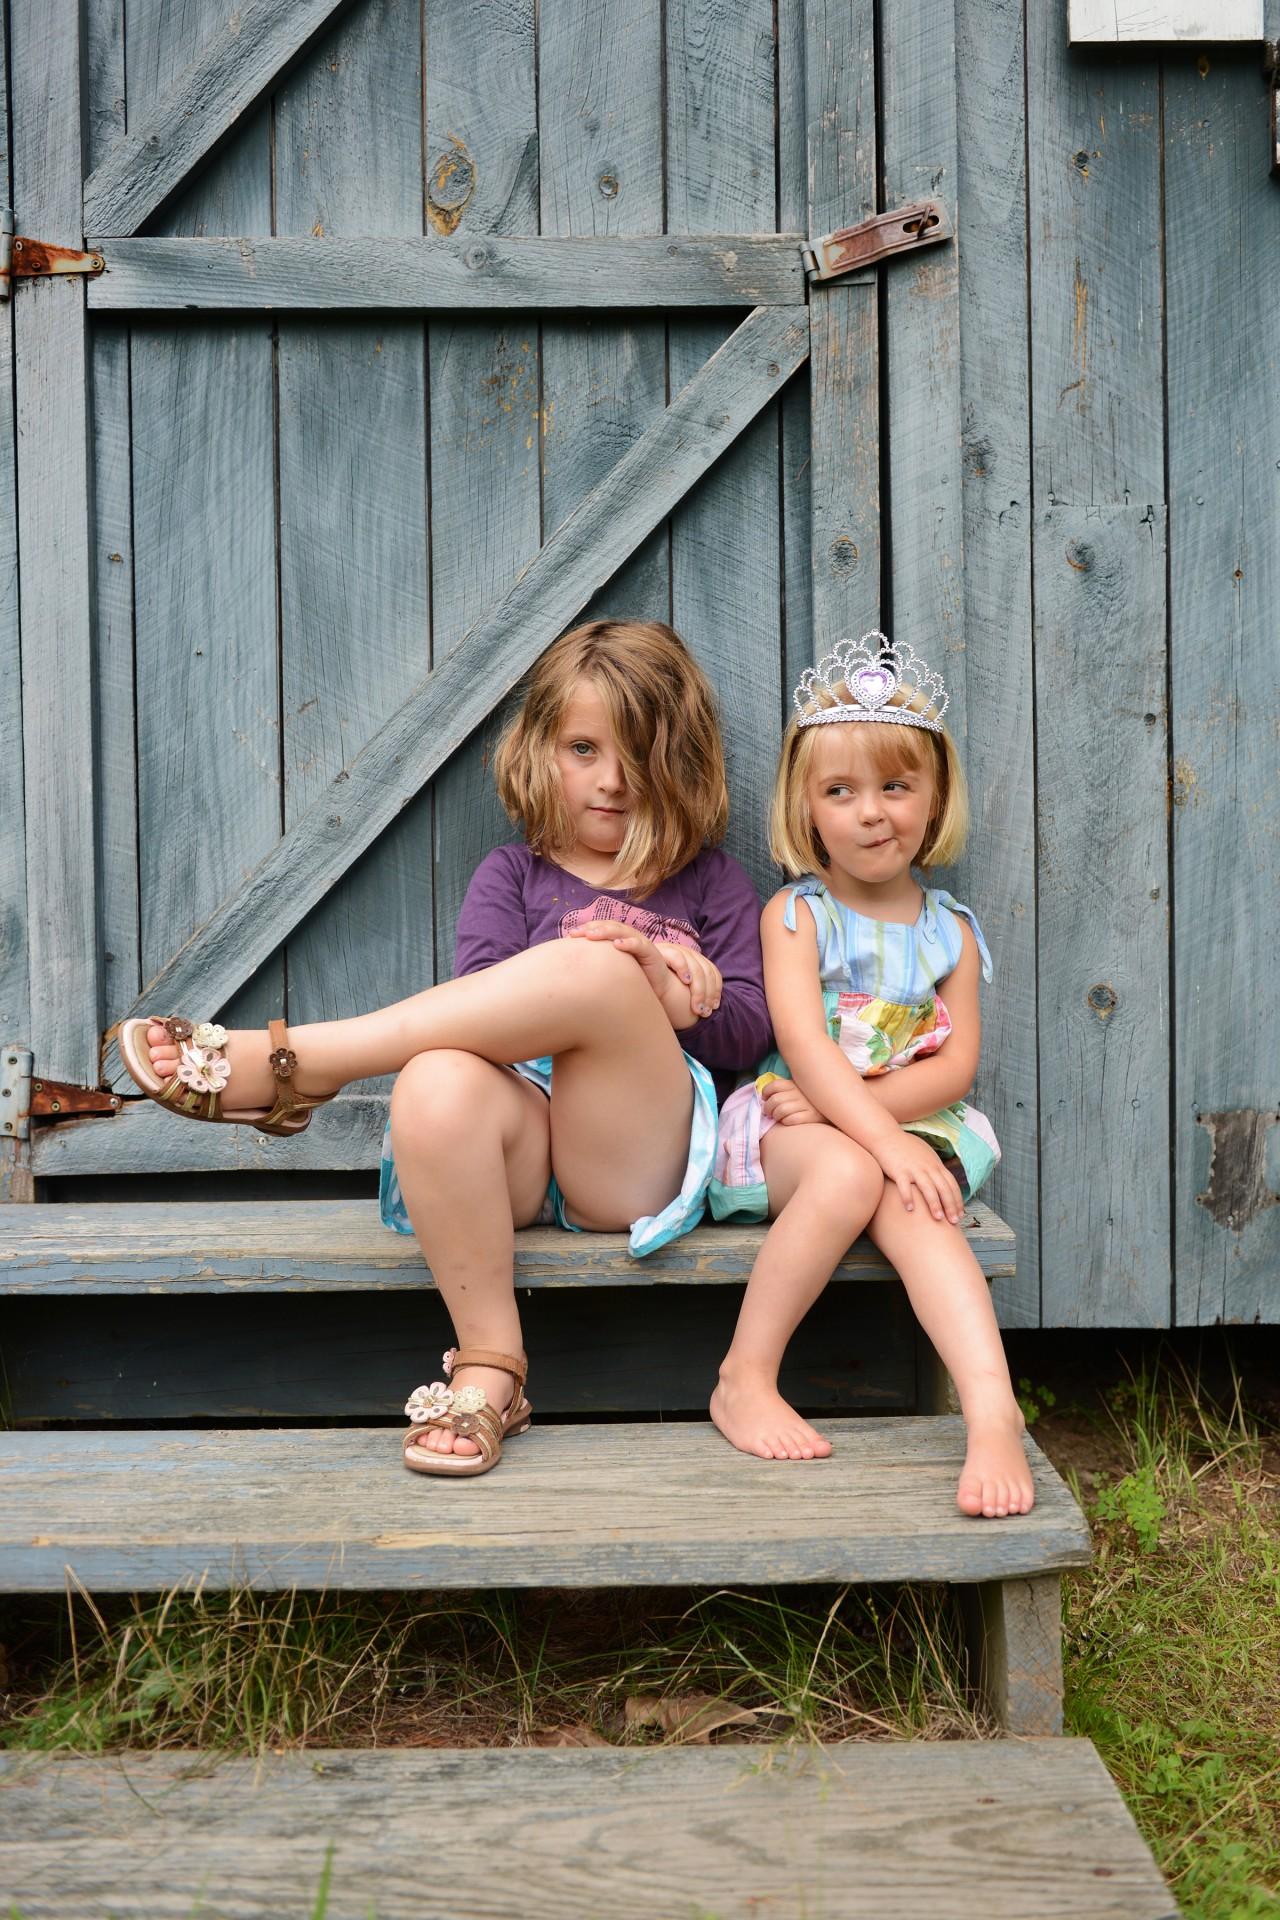 Amelia and Meg